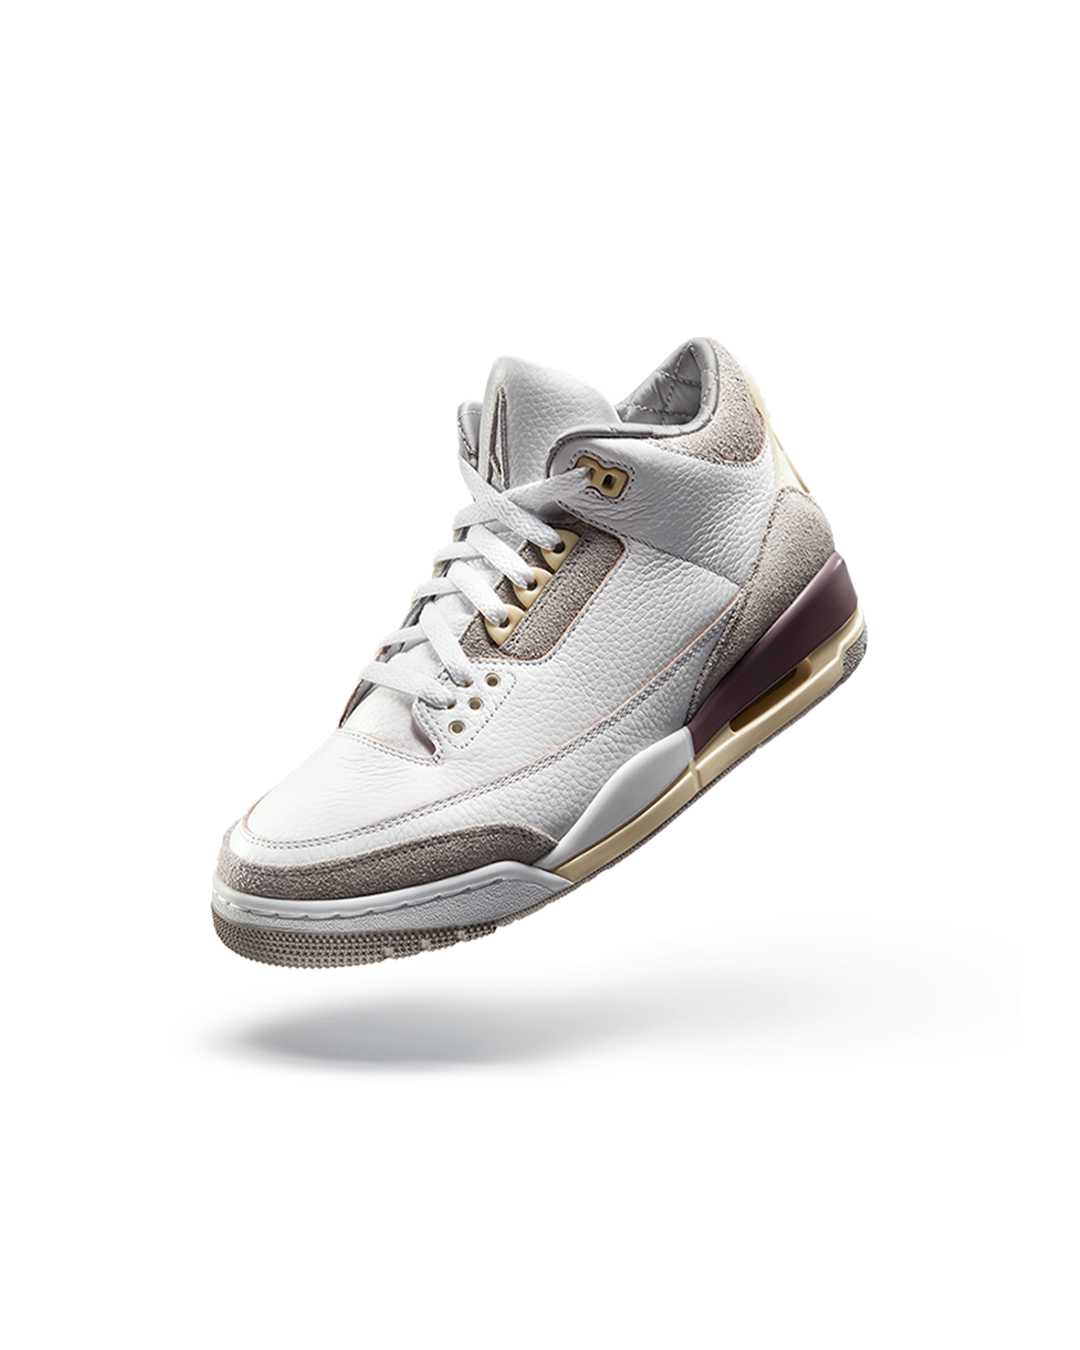 A Ma Maniére x Air Jordan III SP   Raffles Closed!